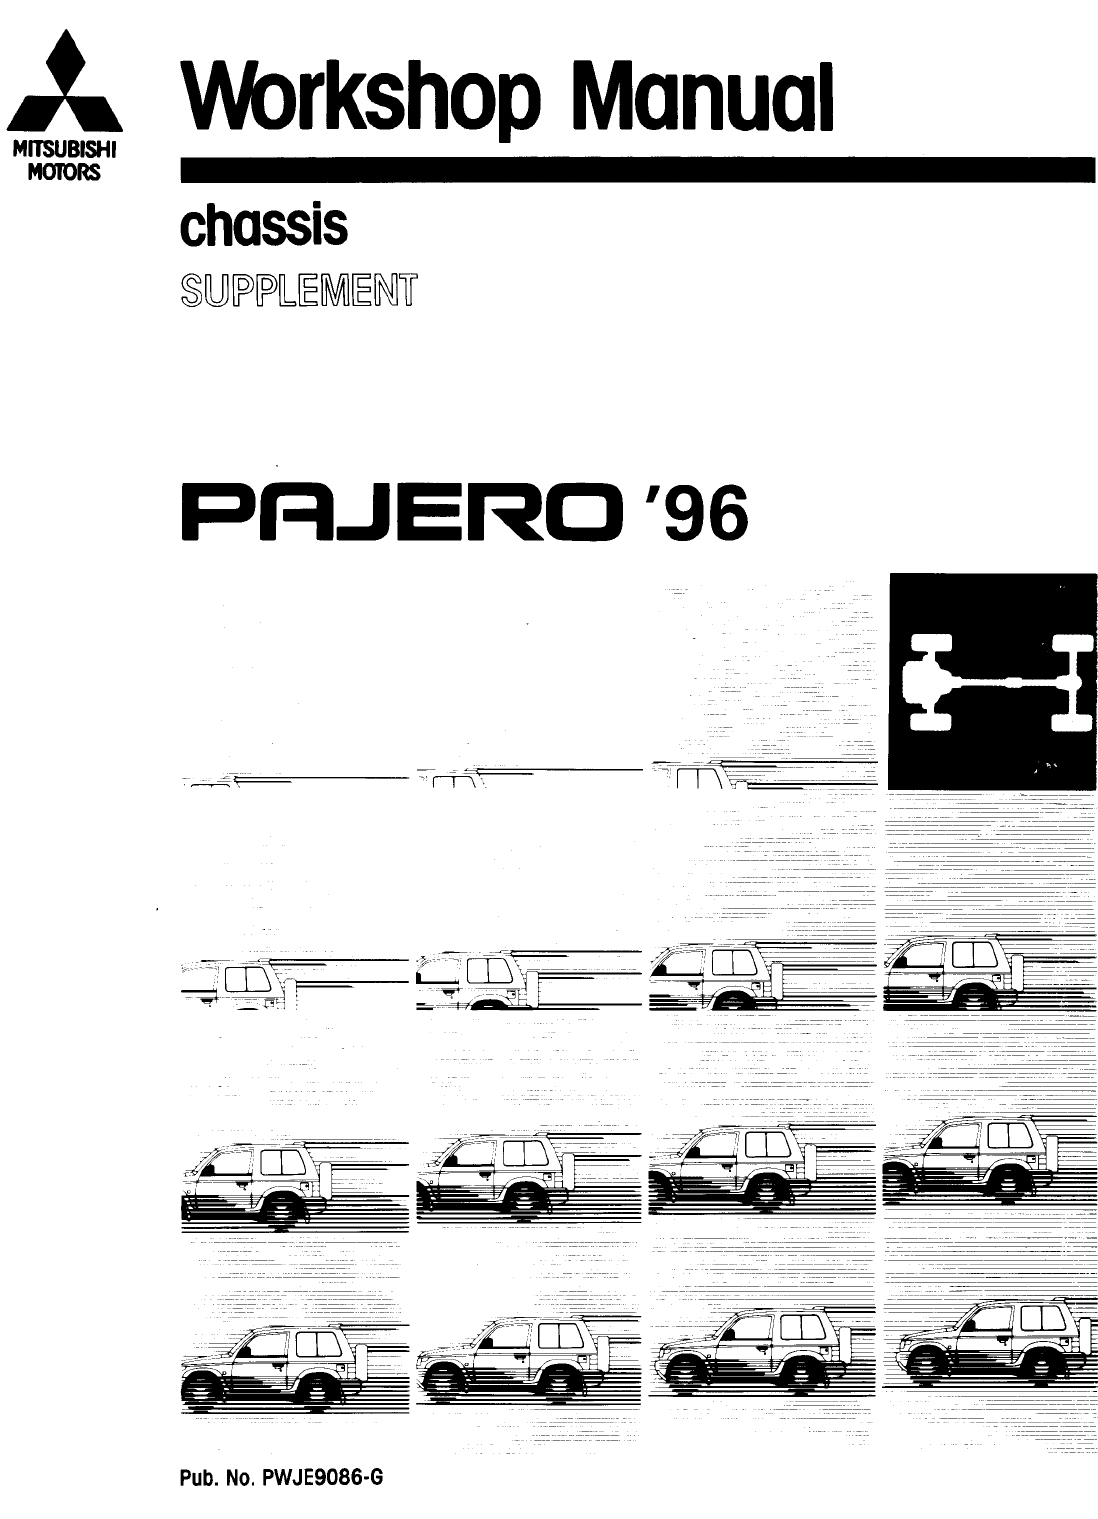 Mitsubishi Pajero 1996 Workshop Manual Pdf Mitsubishi Pajero Manual Workshop